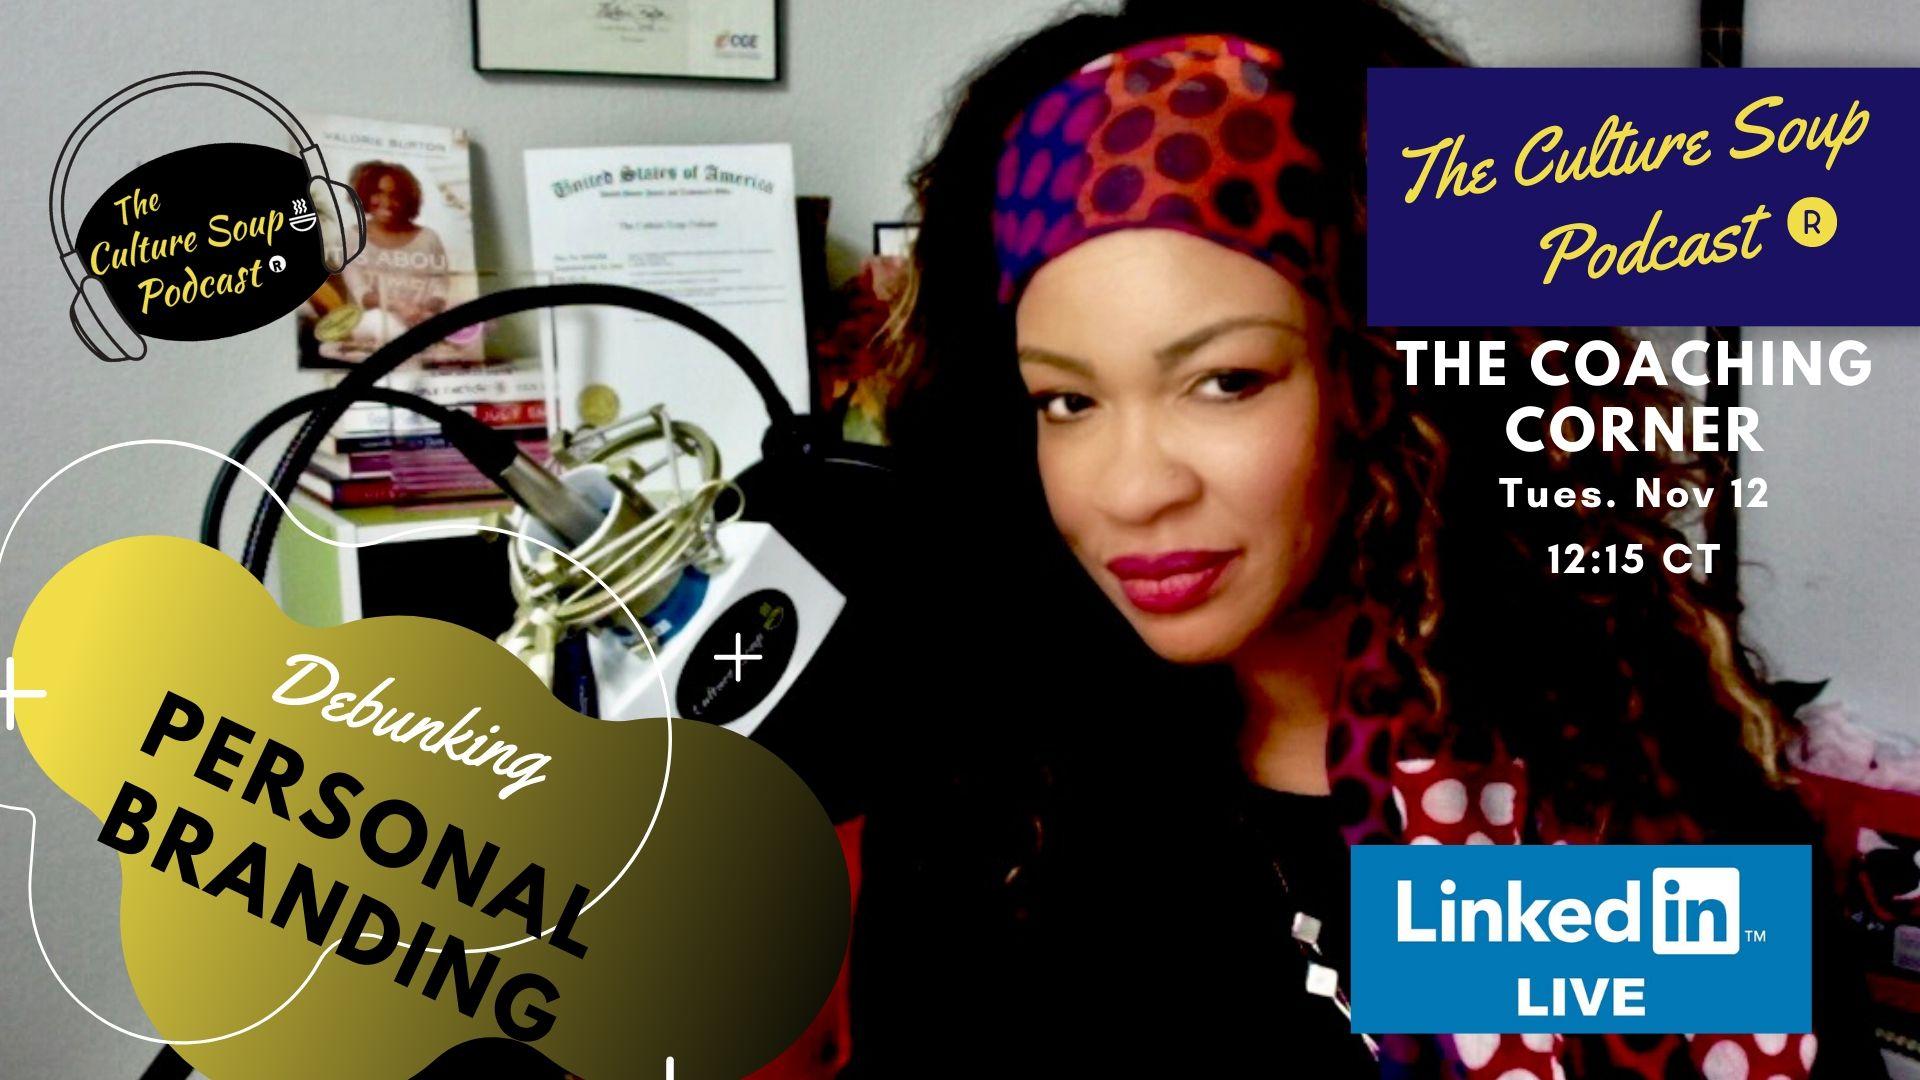 Ep 63: #LinkedinLIVE #TCSPCoachingCorner Premiere Episode